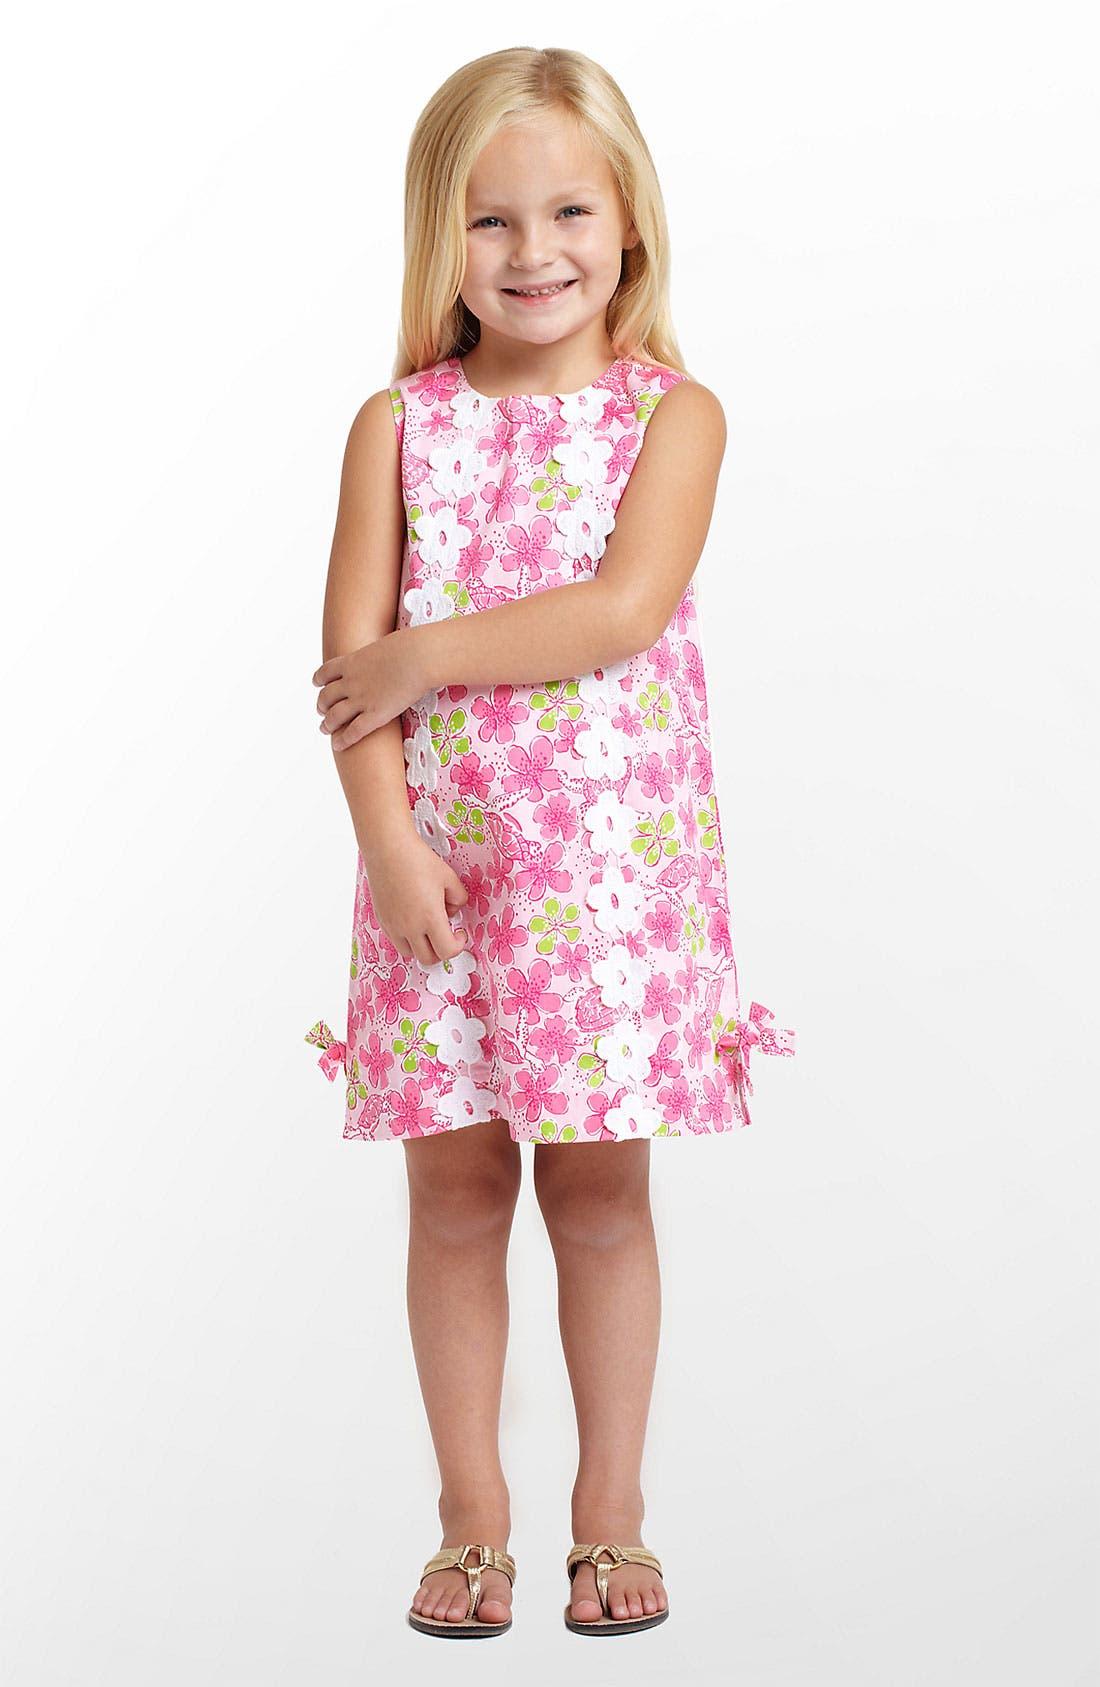 Main Image - Lilly Pulitzer® 'Little Lilly' Shift Dress (Little Girls & Big Girls)